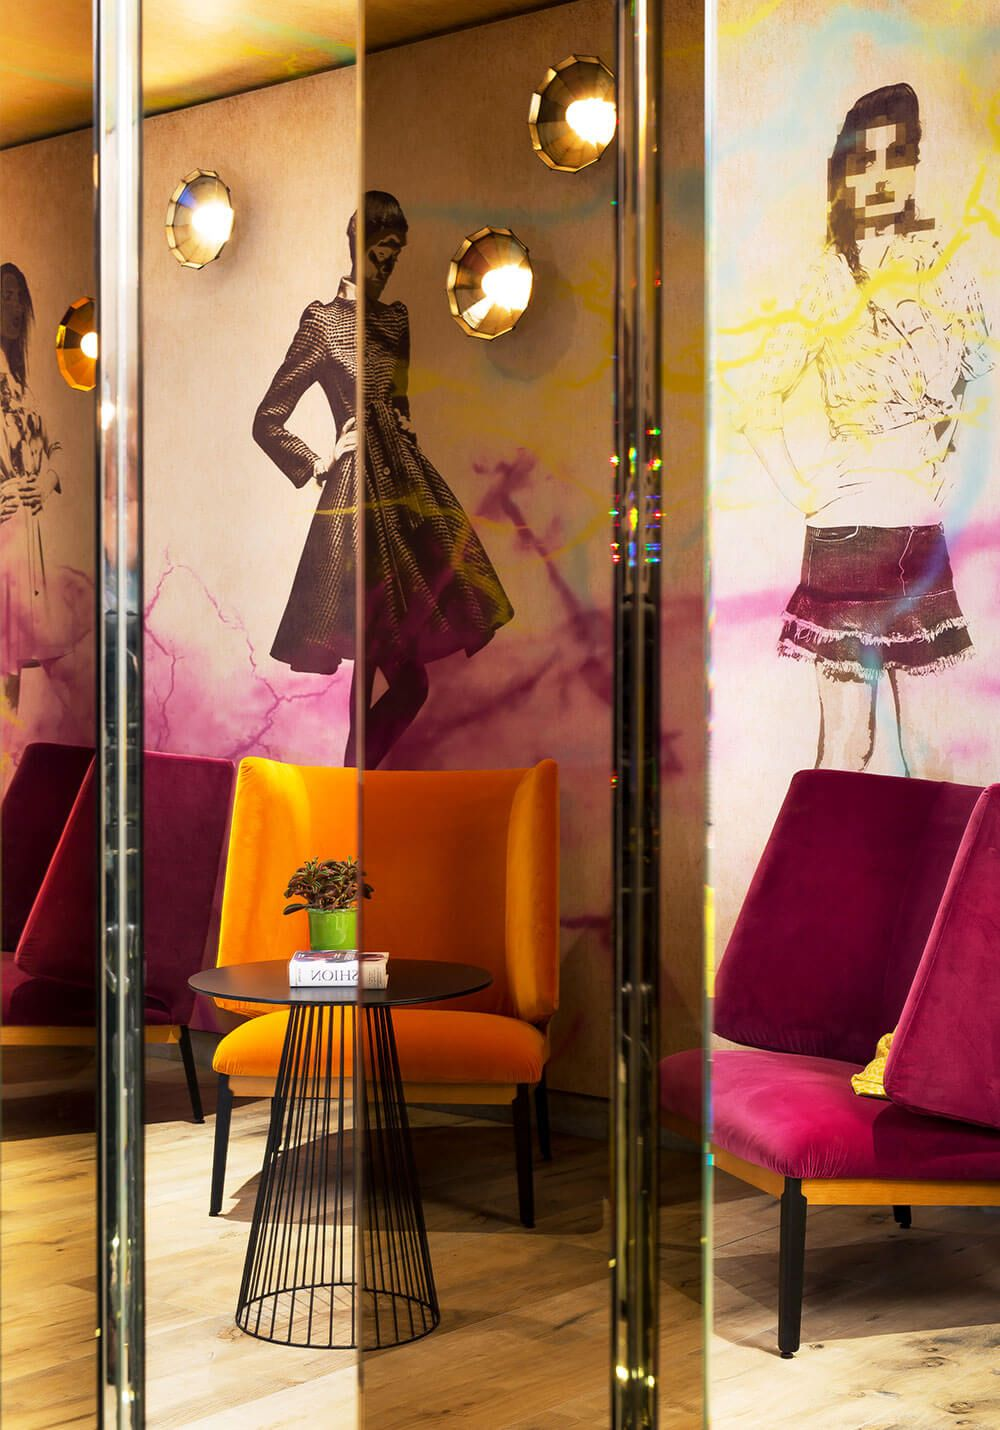 mercure hotel wittenbergplatz berlin   kitzig interior design